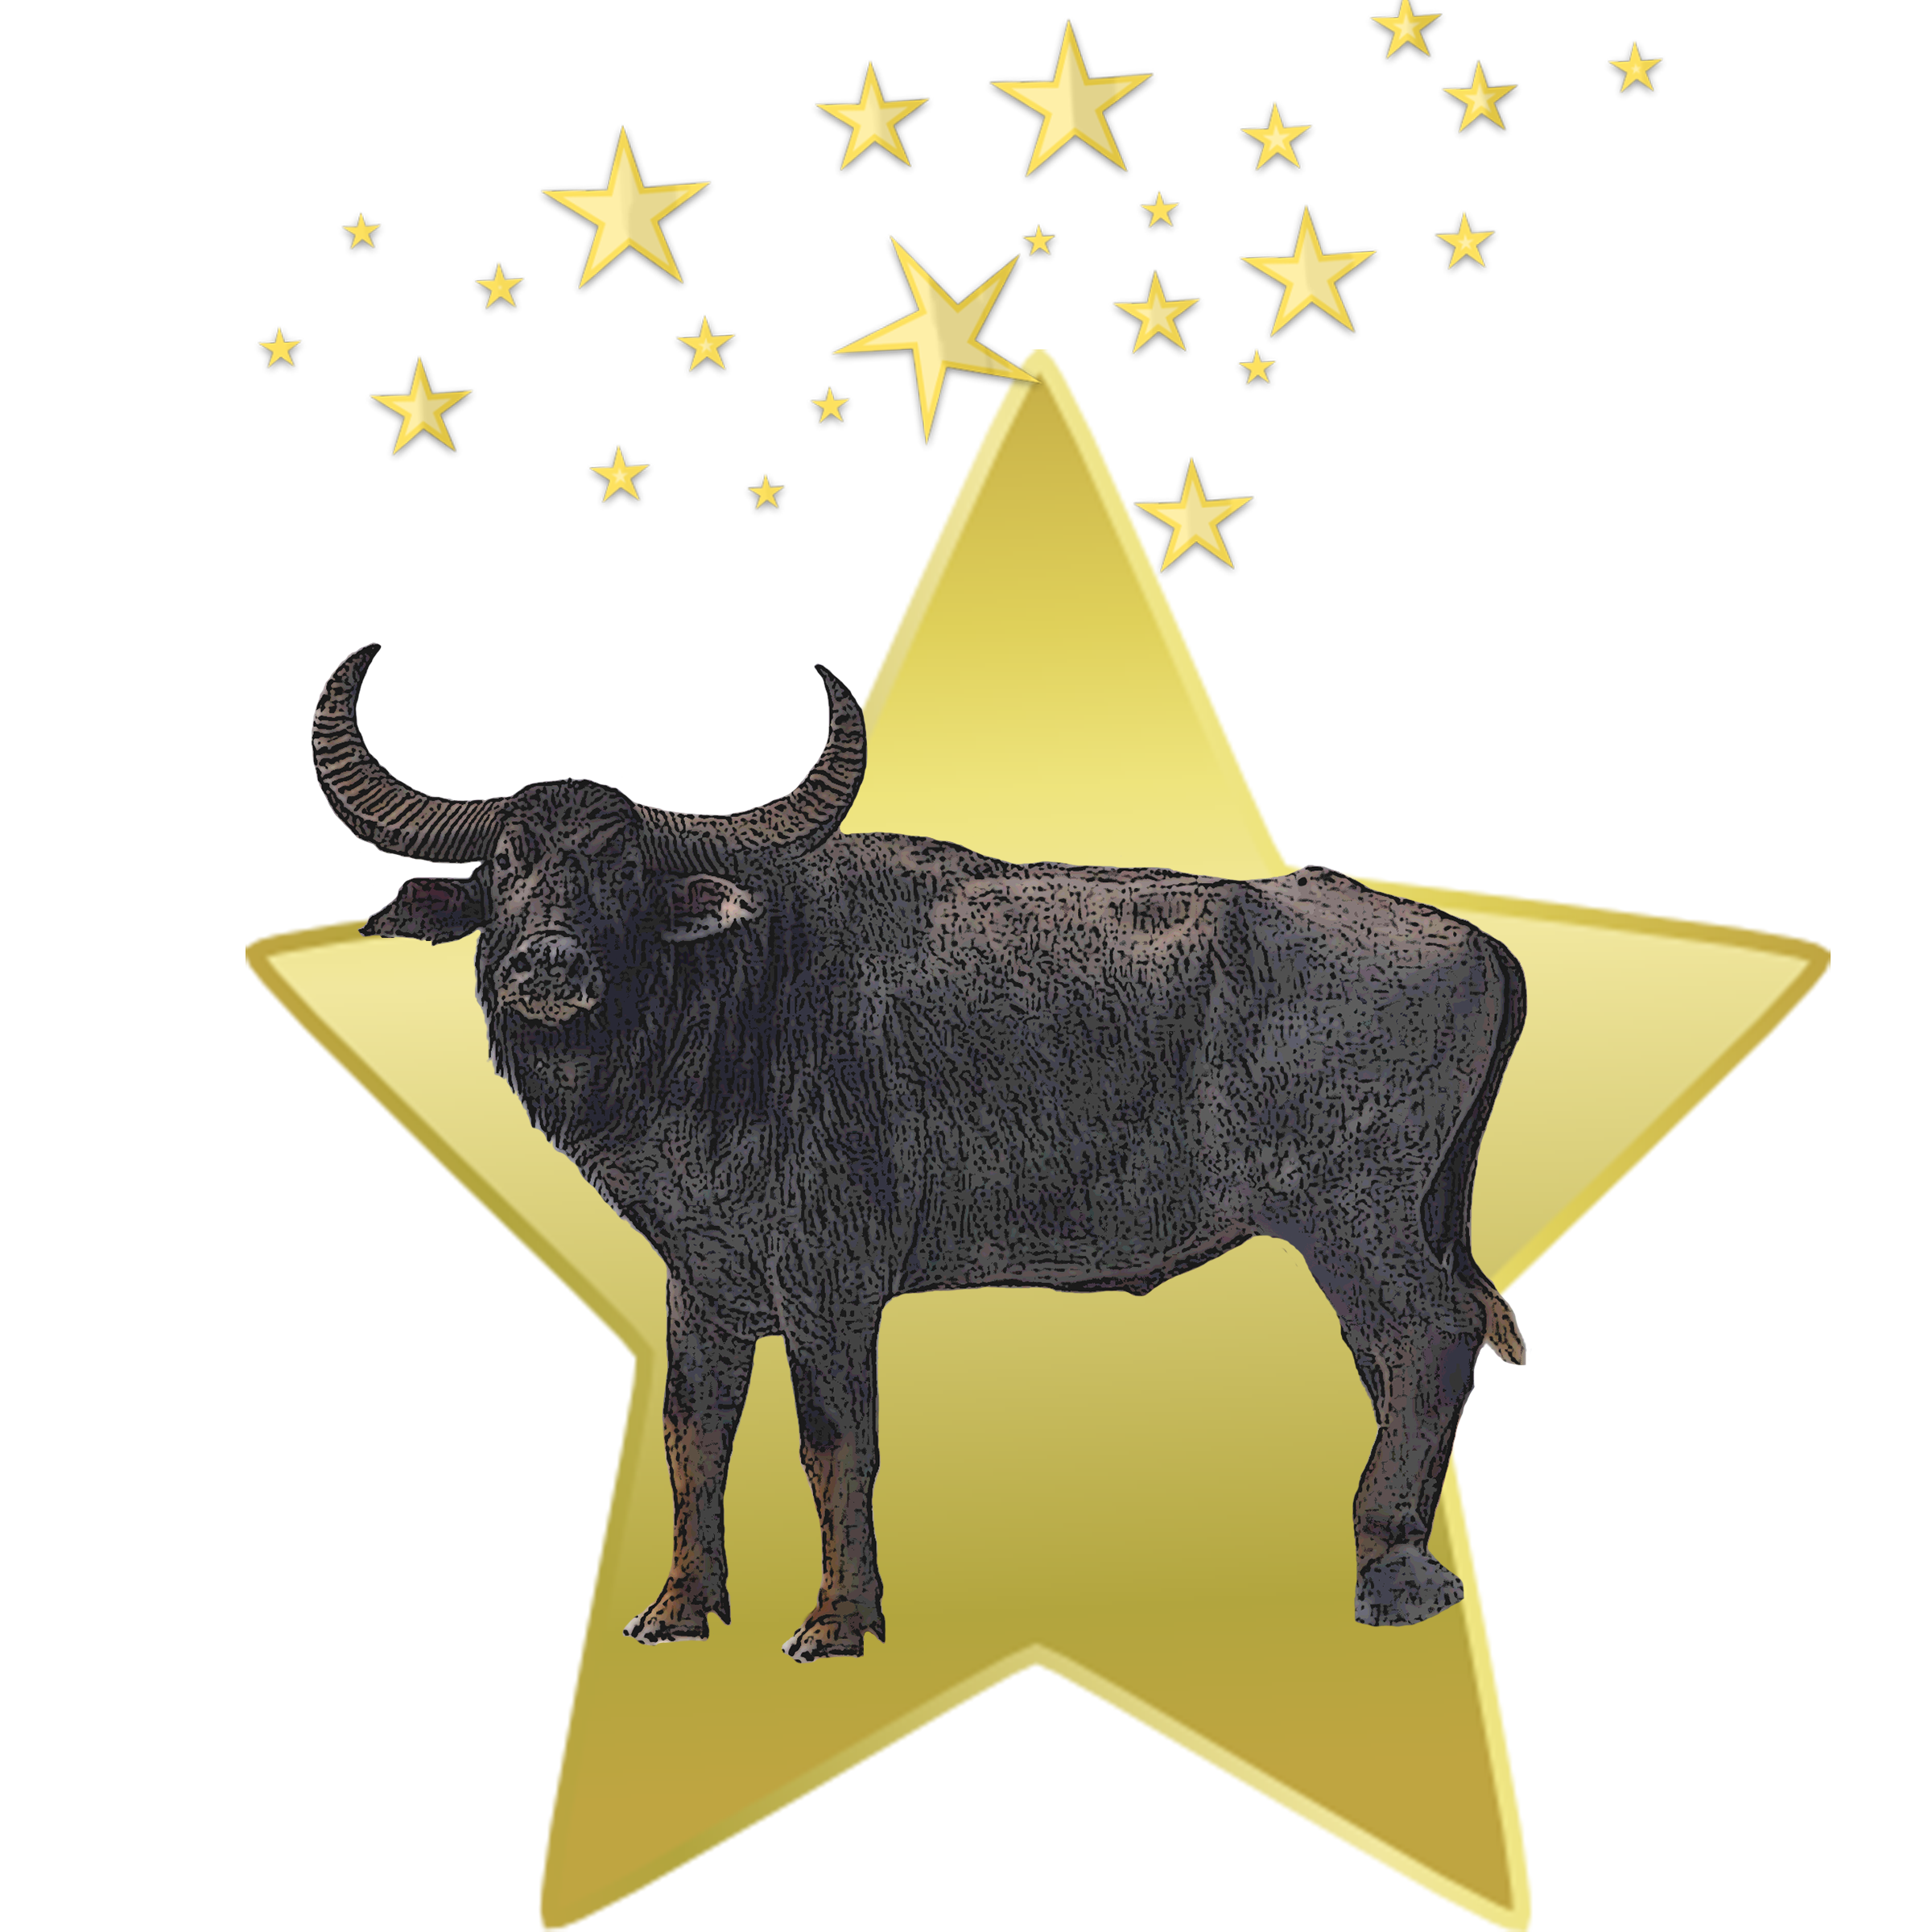 Ox clipart fat sheep. All black moon kittysol